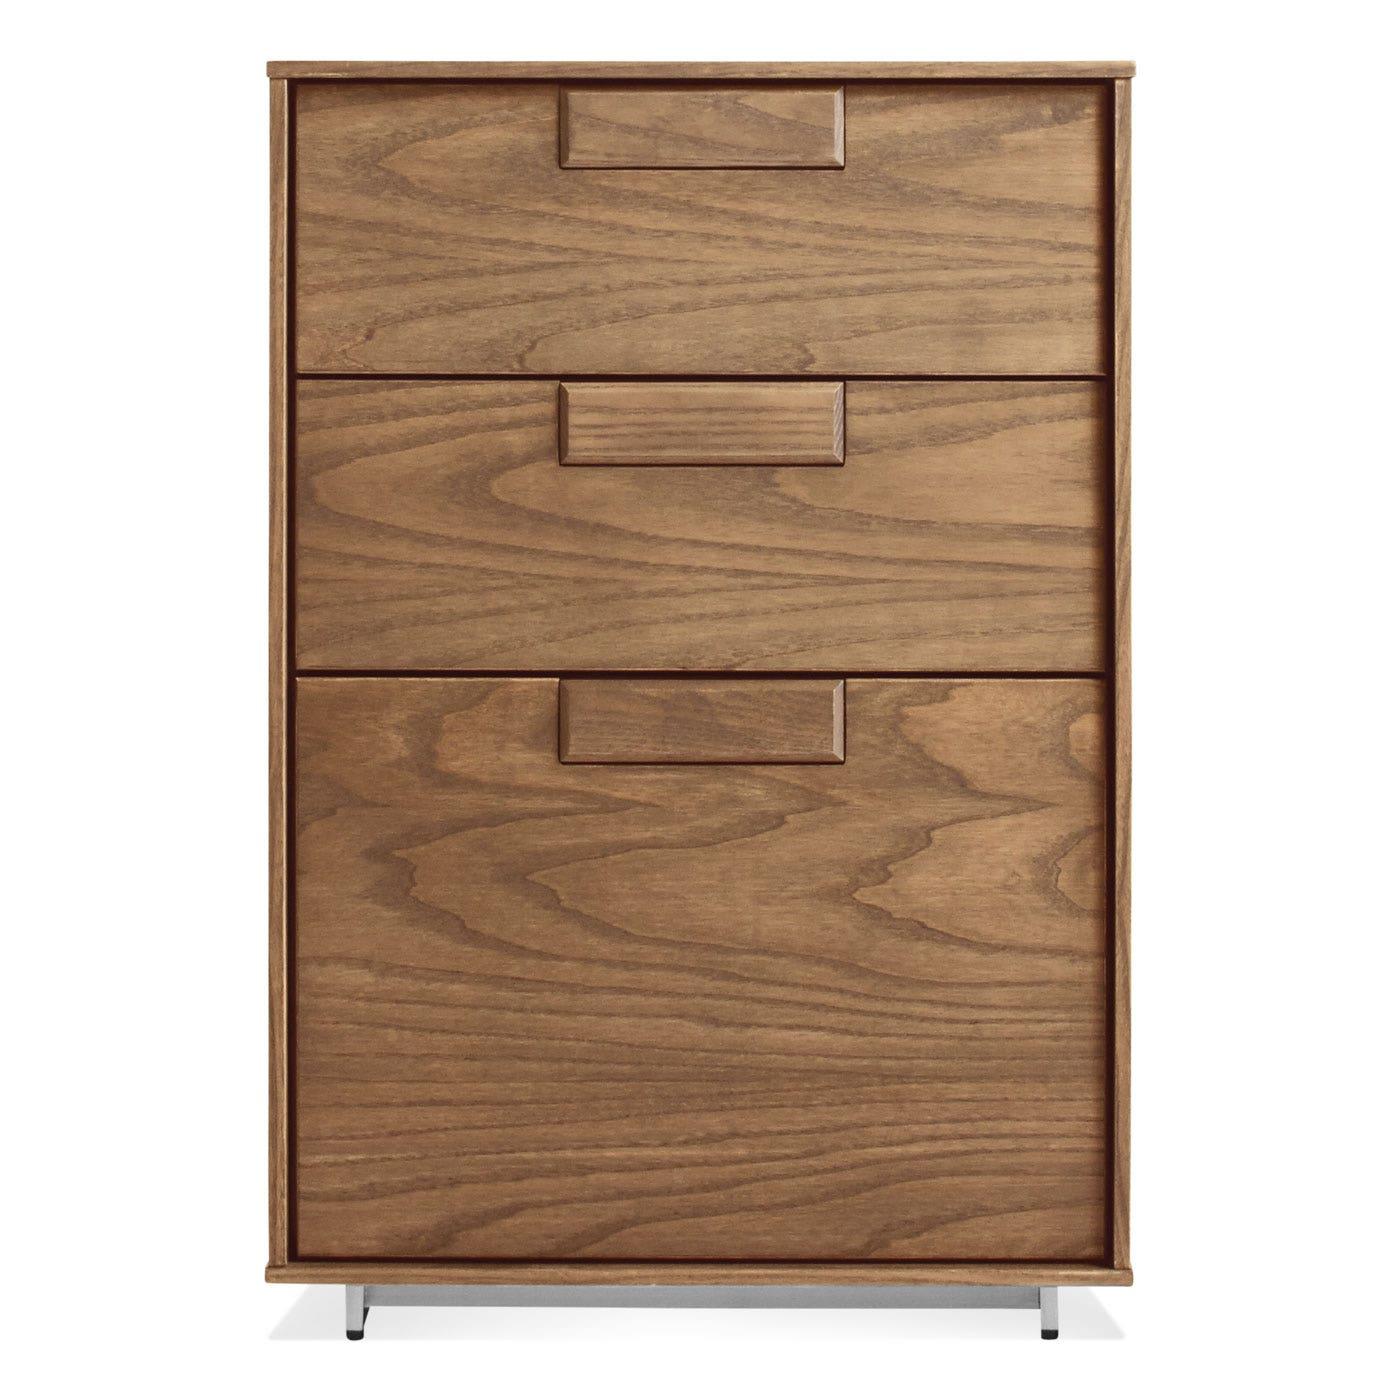 Series 11 Modern Wood Filing Cabinet | Blu Dot